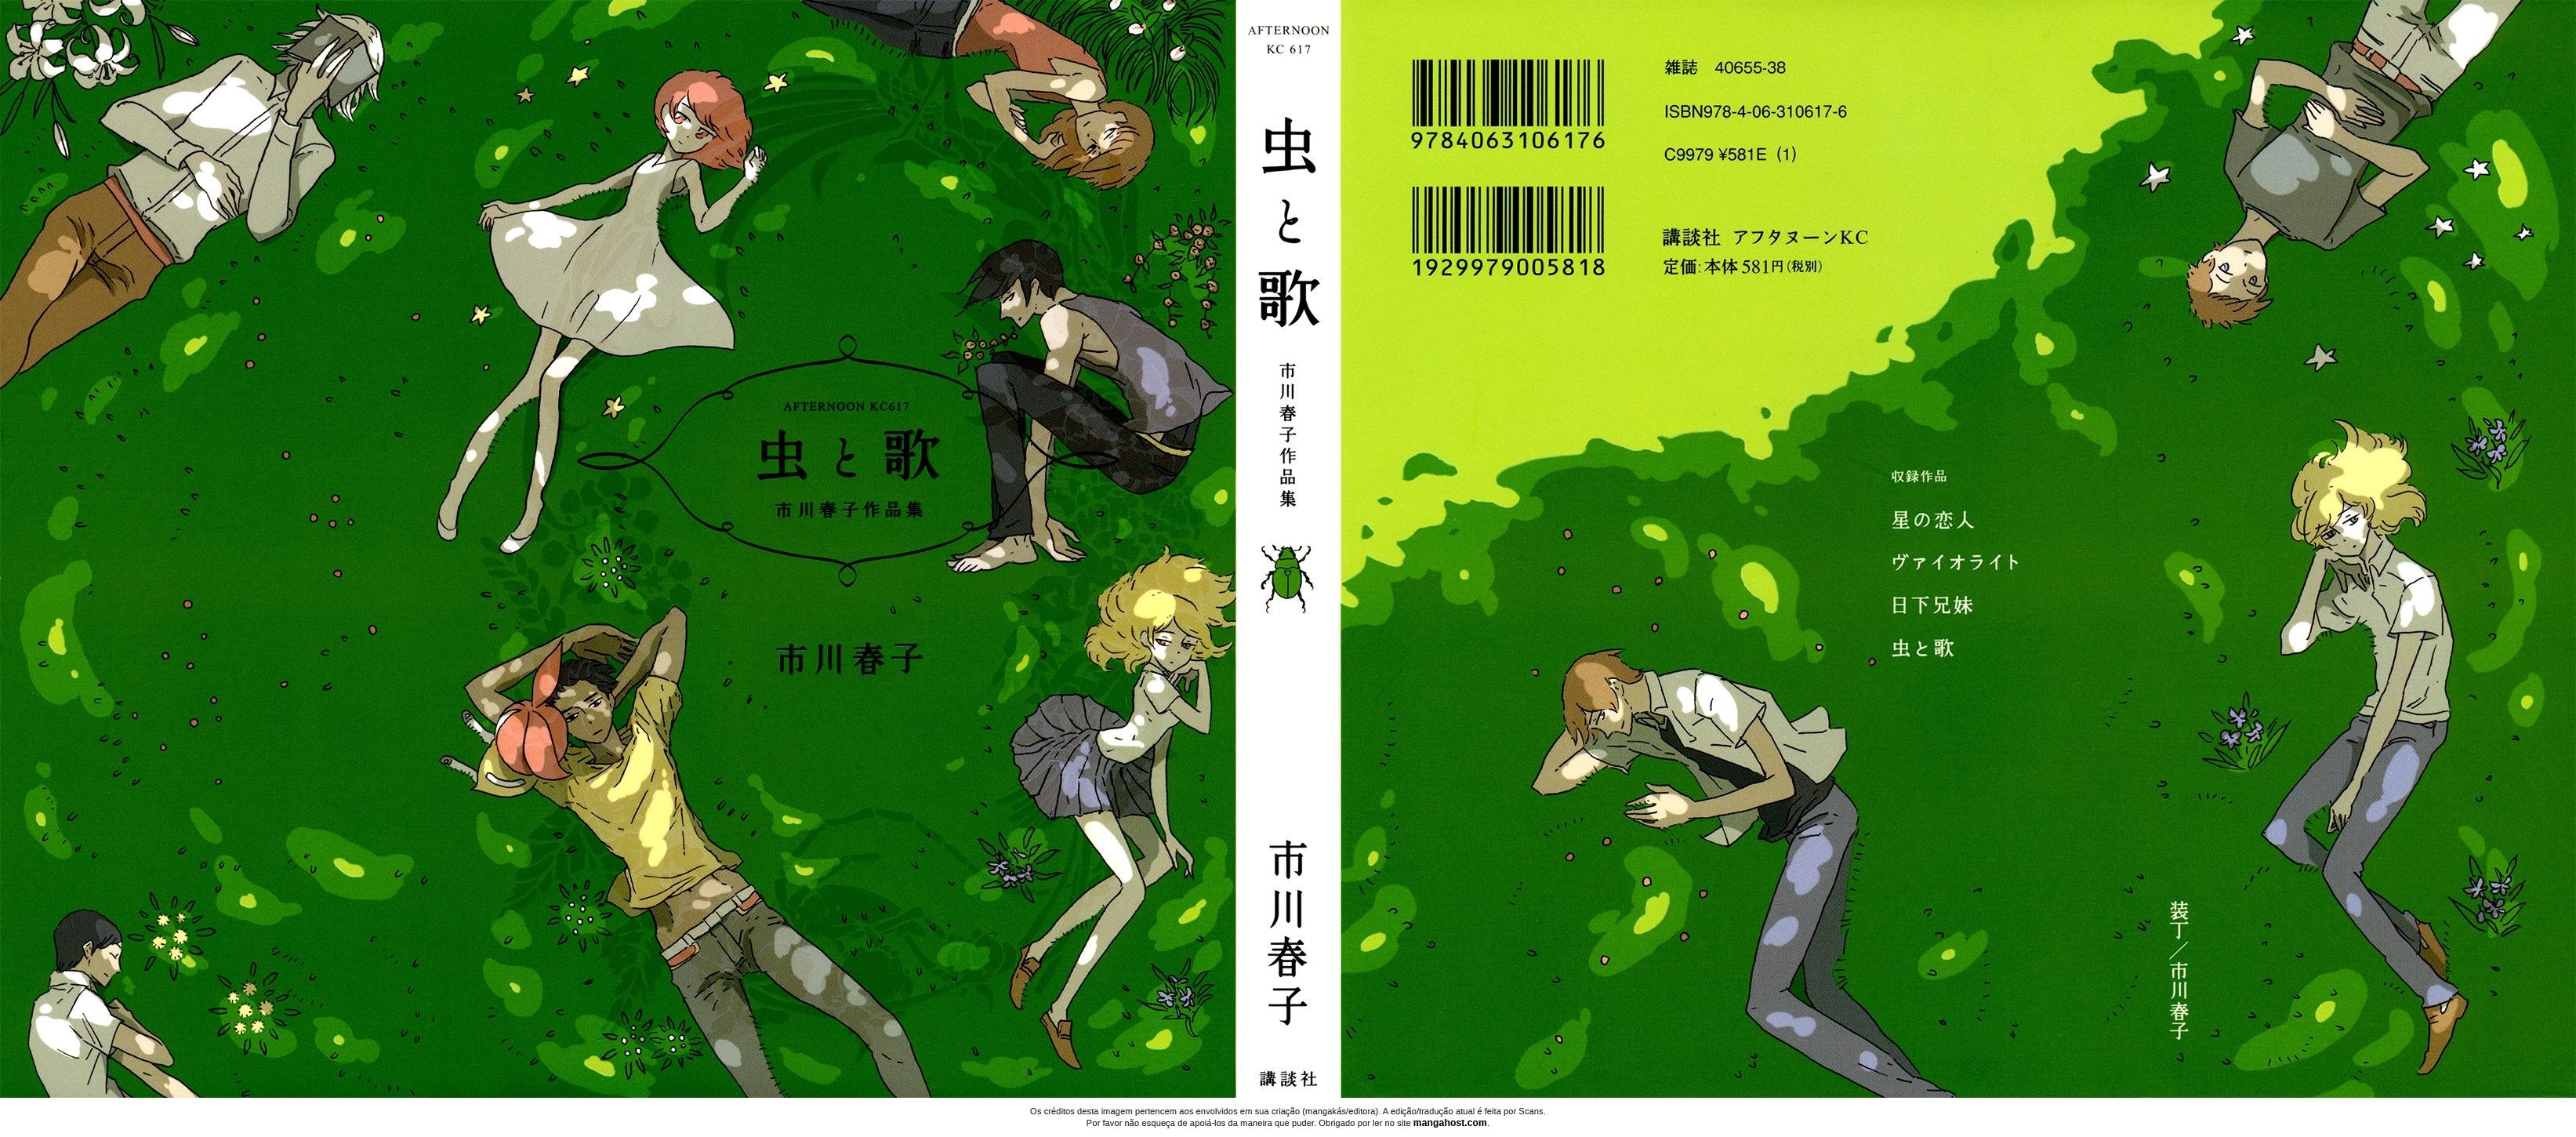 https://nine.mangadogs.com/br_manga/pic/24/6936/6506080/MushitoUtaCapiacutetuloone_0_25.jpg Page 1